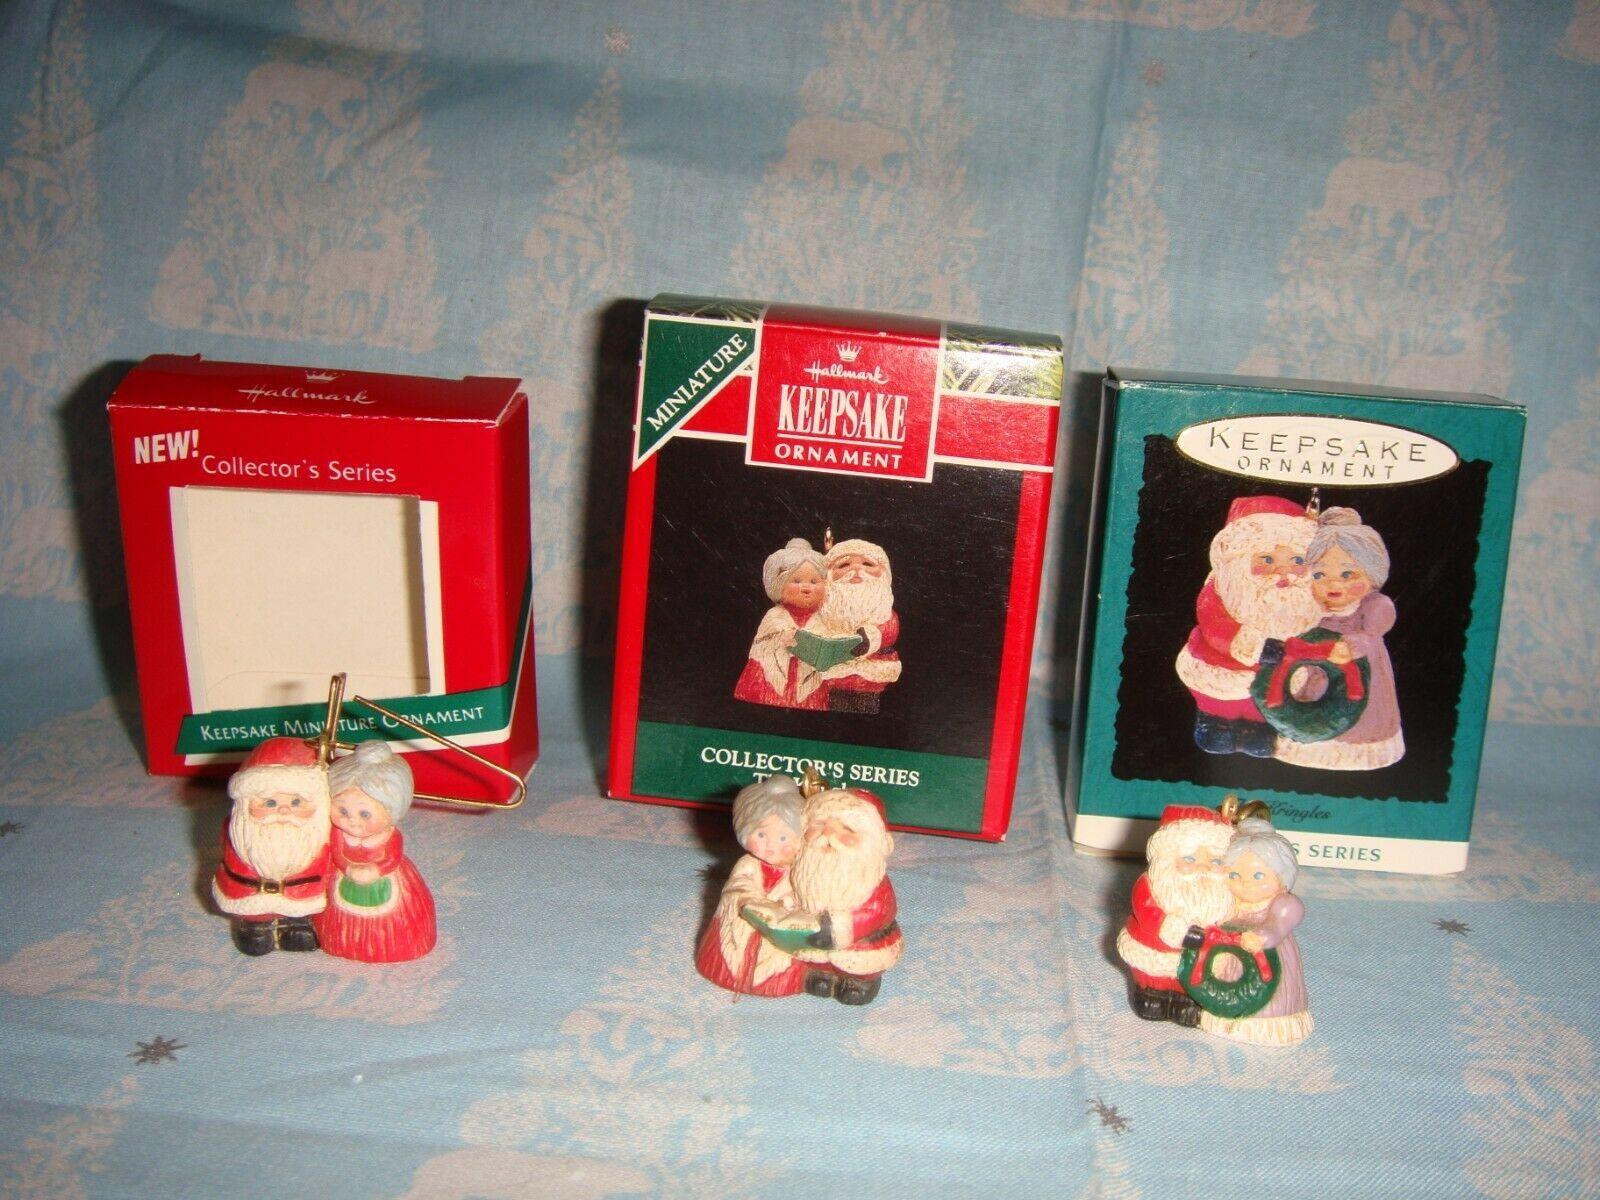 Hallmark Miniature The Kringles 1989, 1992 & 1993 Lot Of 3 Series Ornaments image 3